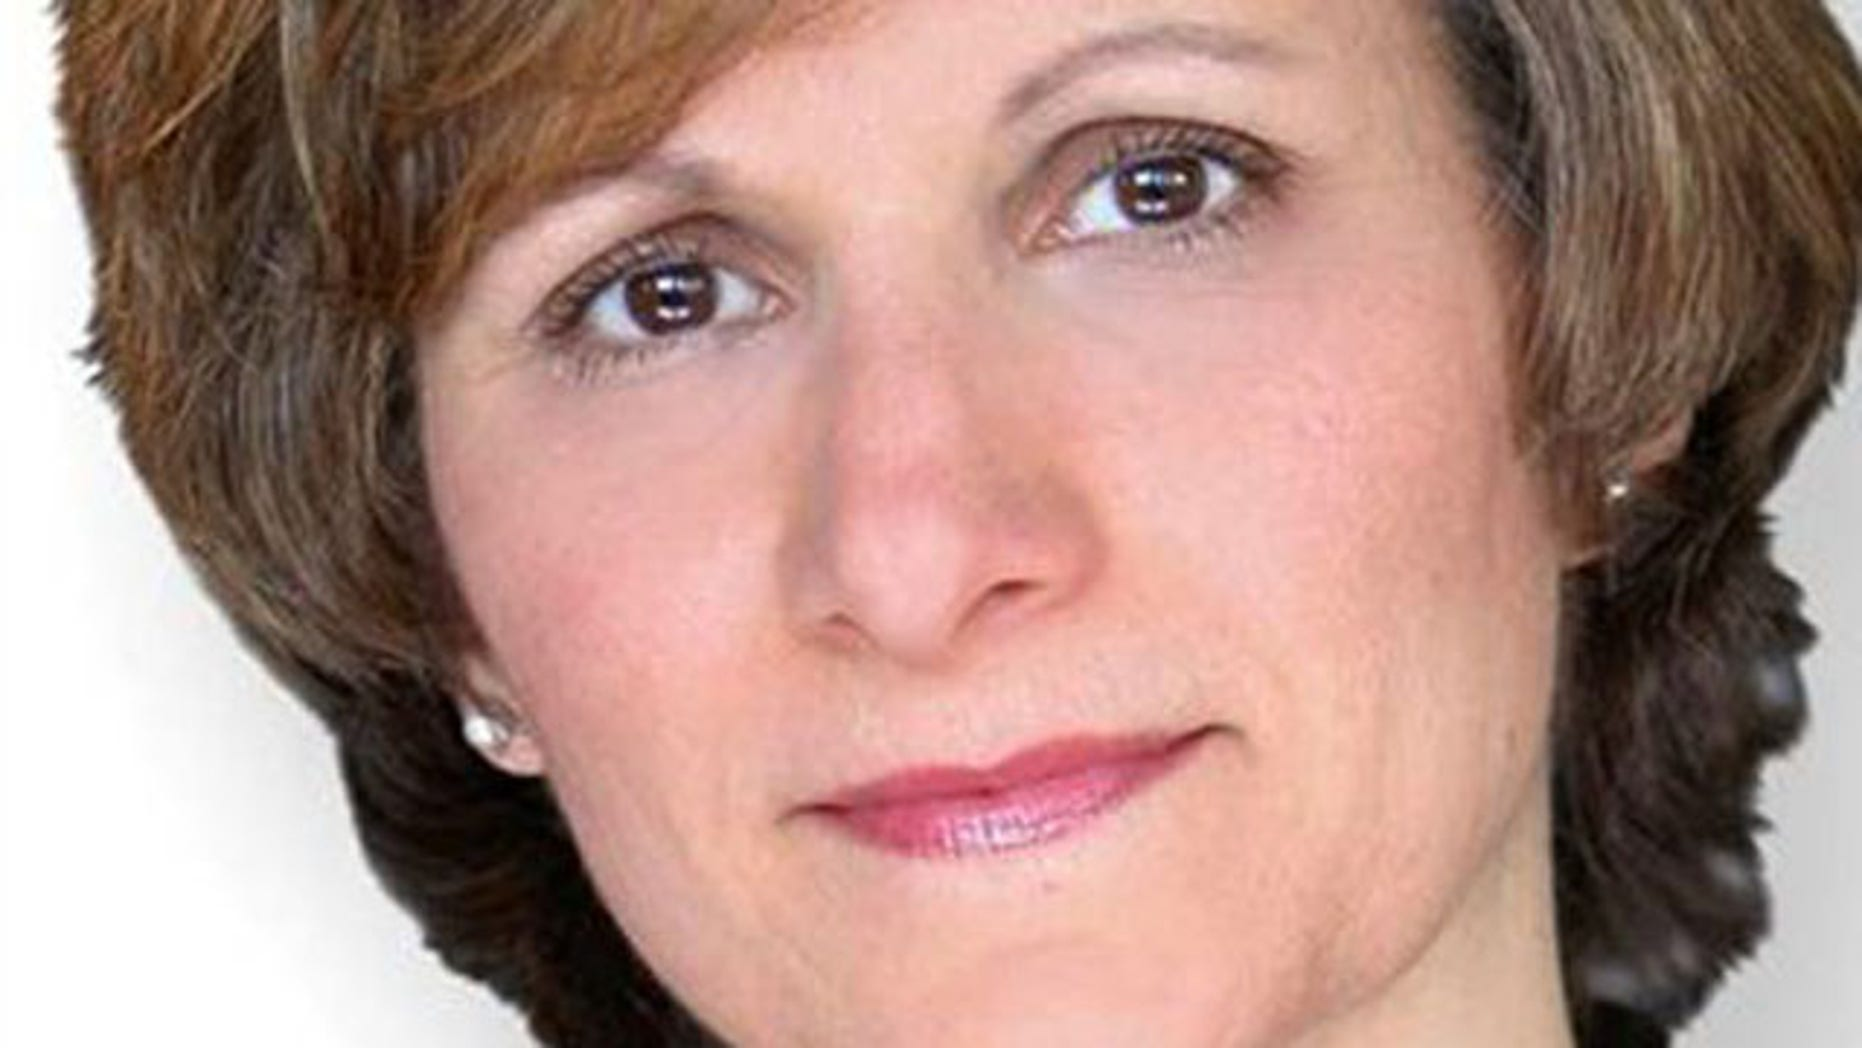 FILE - This undated photo released by the Suzanne Bonamici campaign shows U.S. Congressional candidate, and former Oregon state Senator, Democrat Suzanne Bonamici.